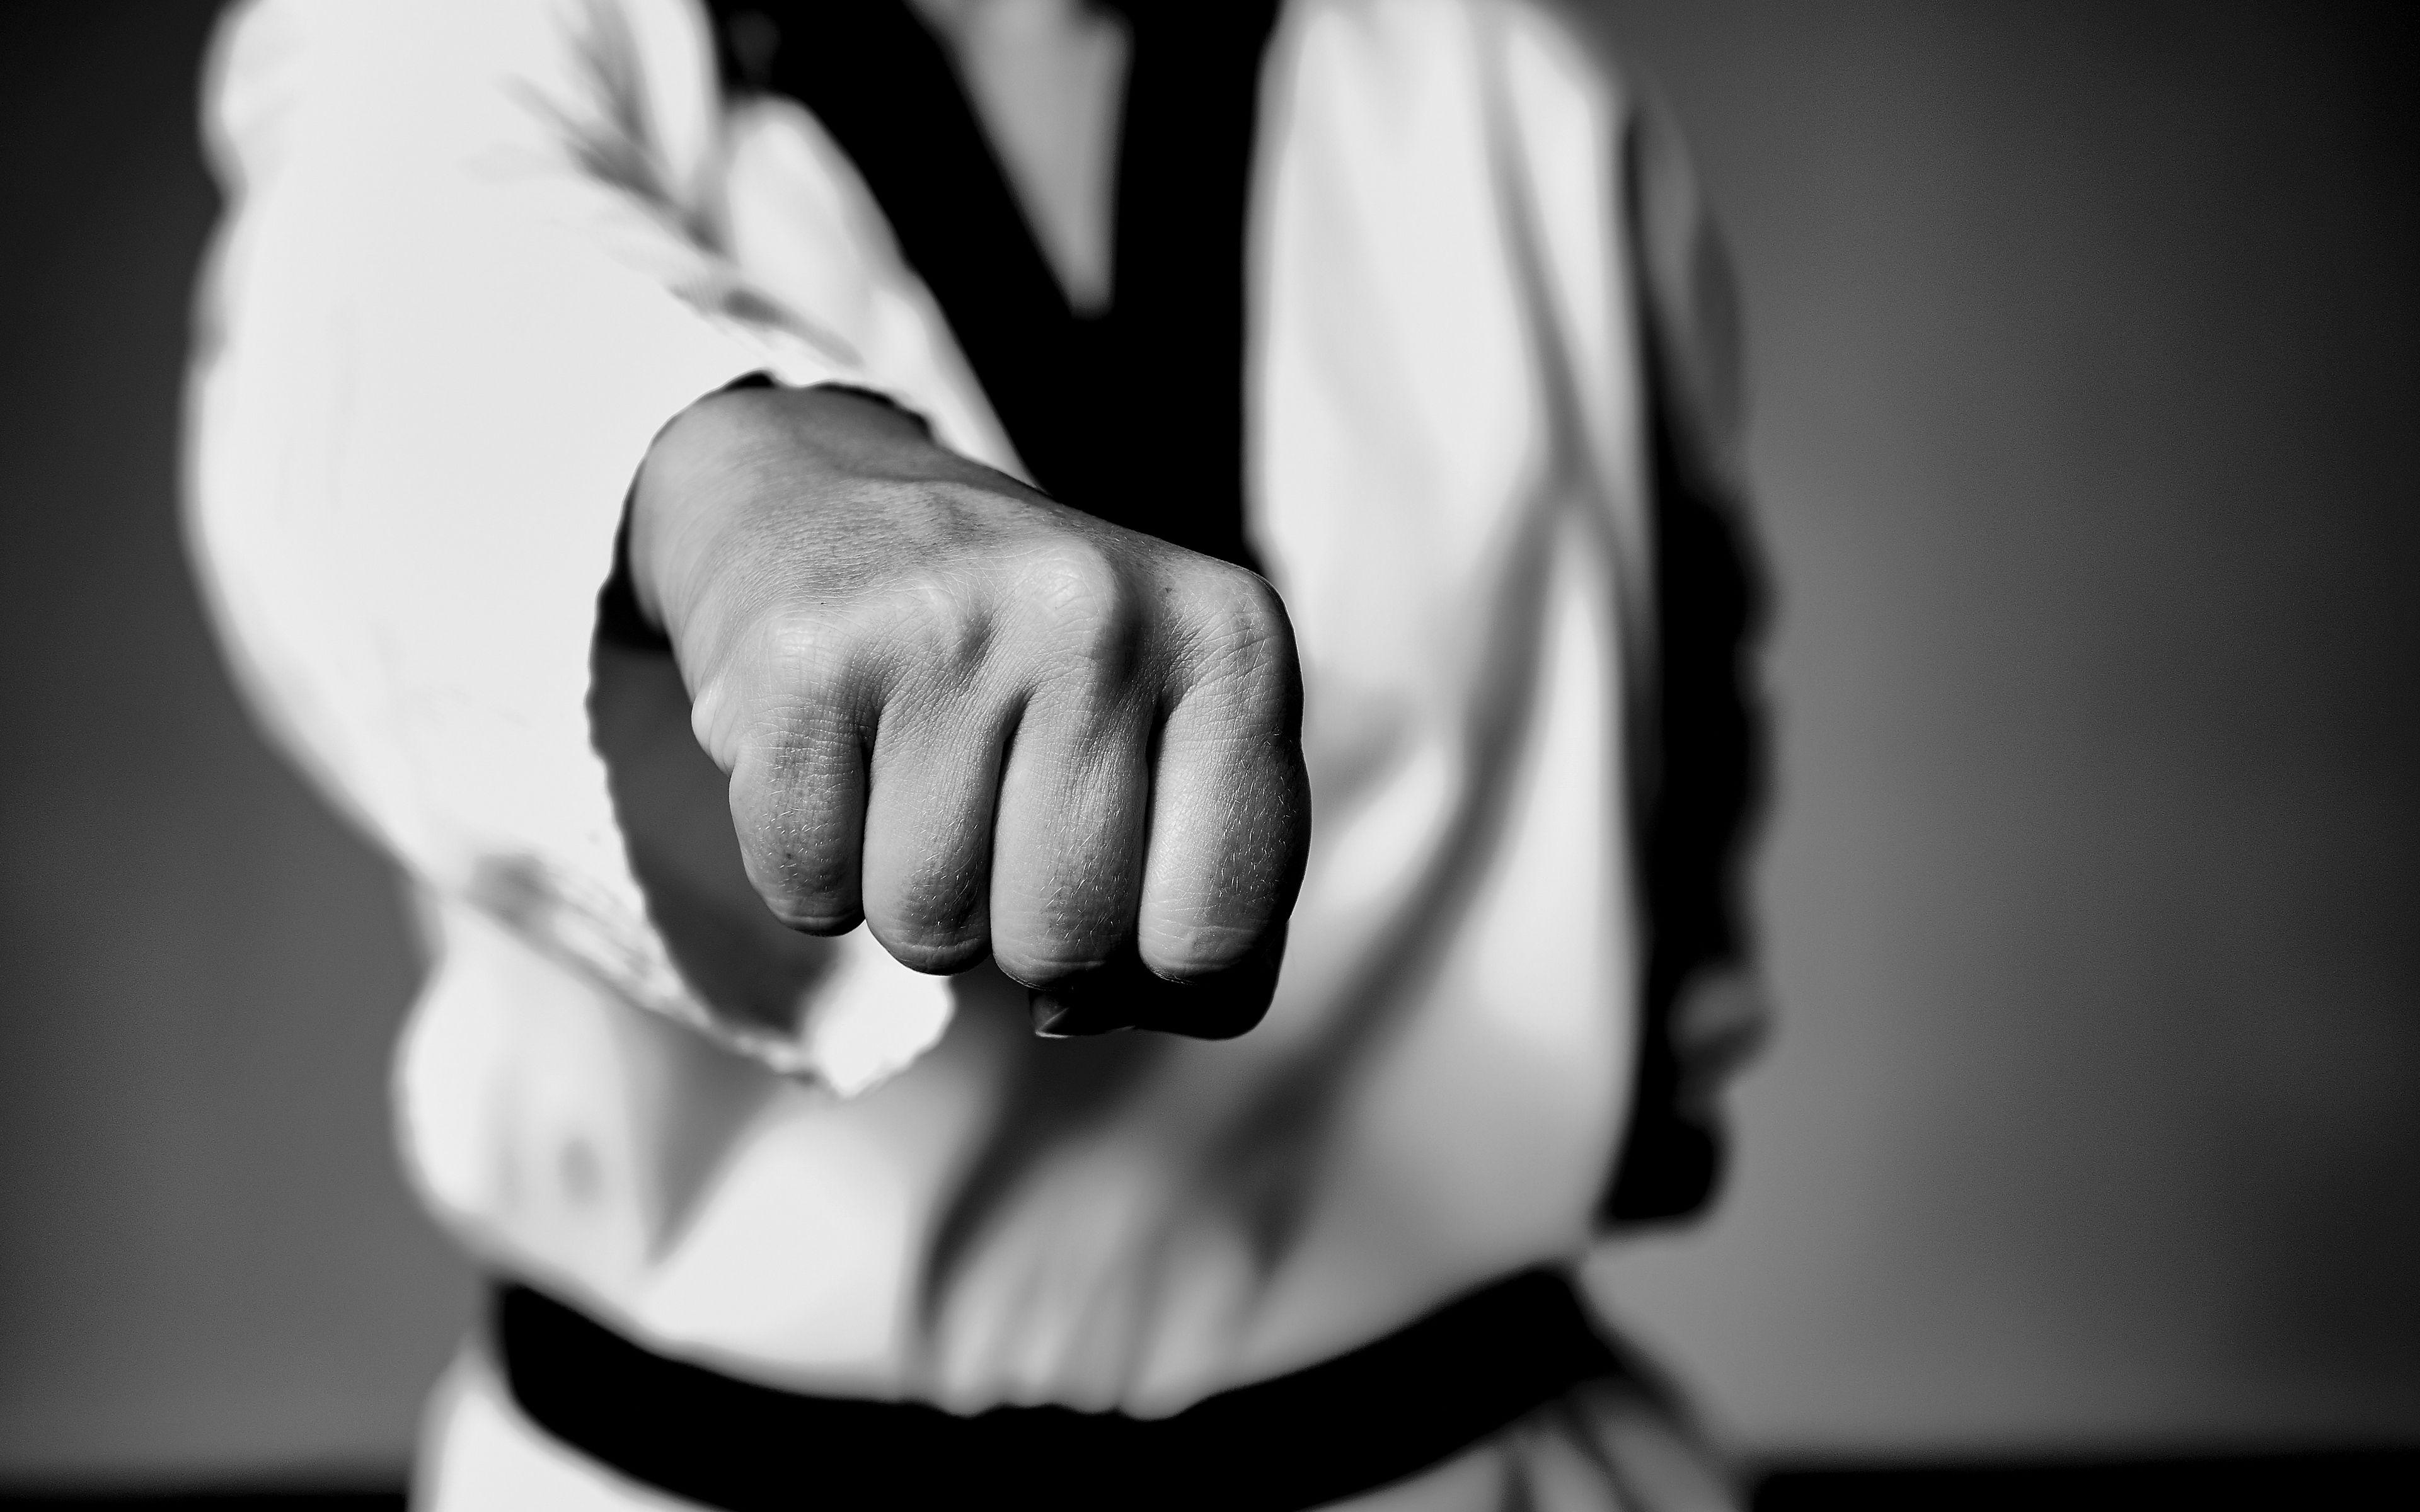 Taekwondo Wallpapers (19 Wallpapers) – HD Wallpapers ...